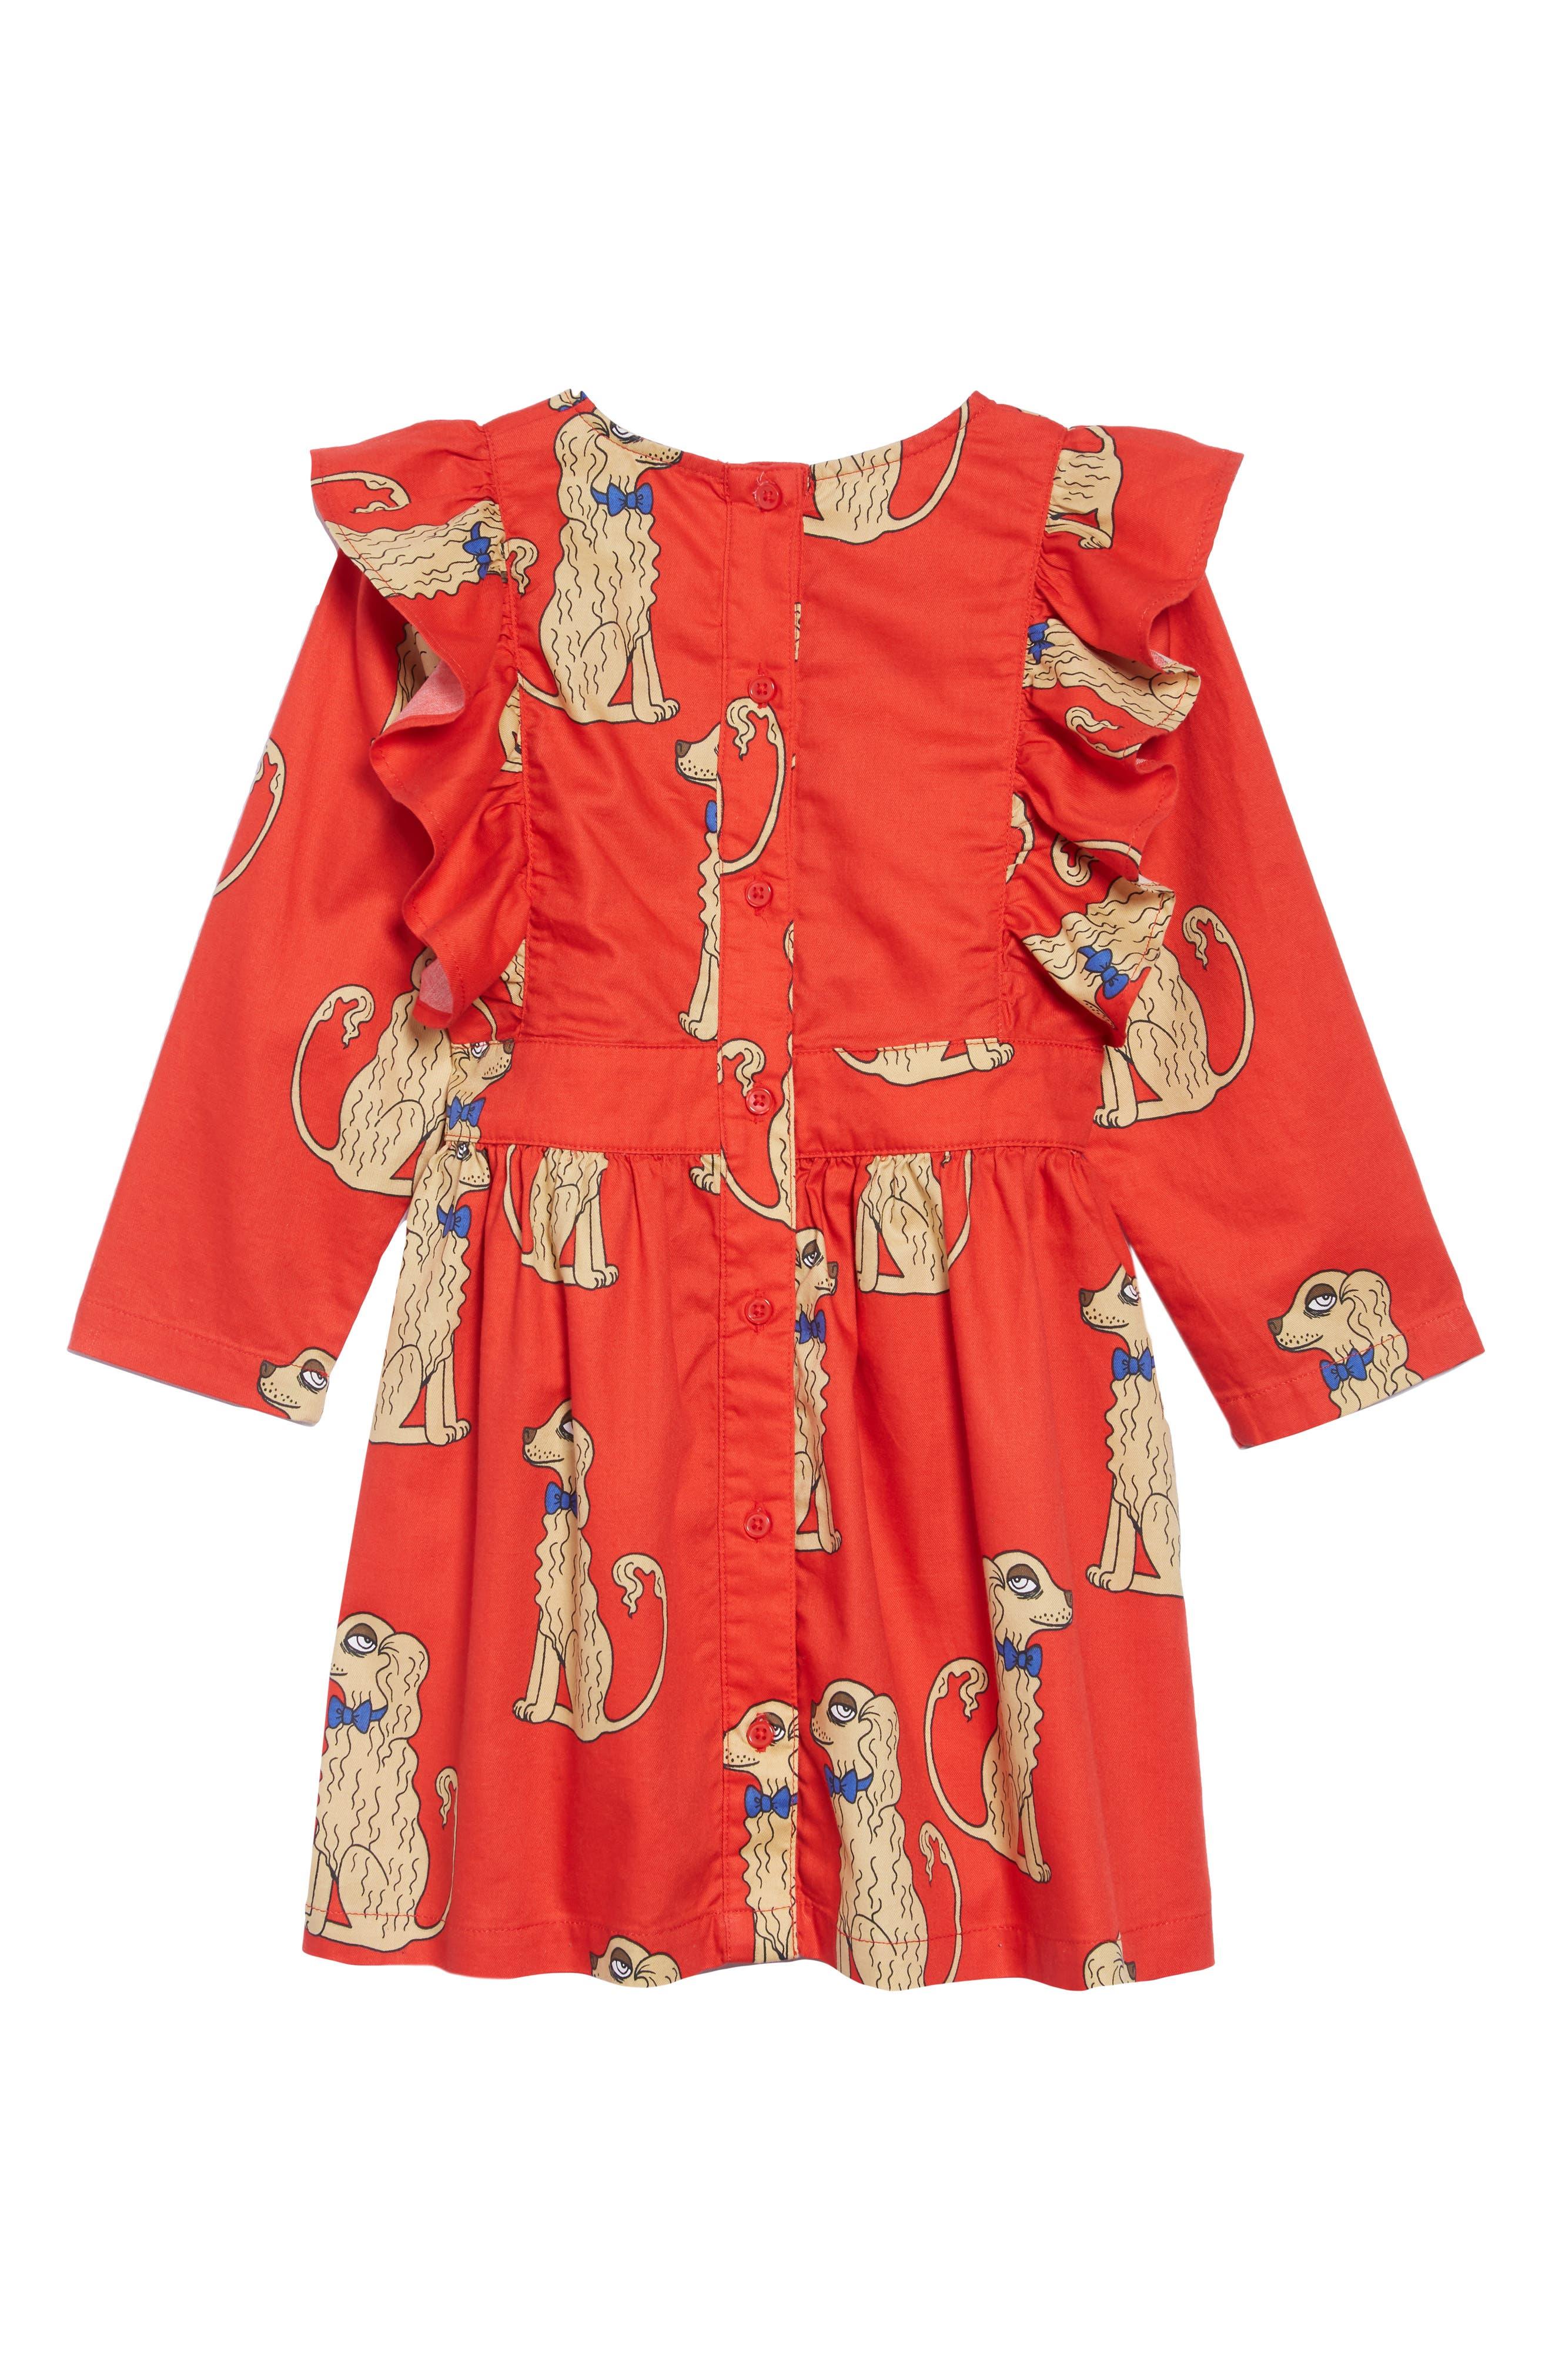 Spaniels Ruffle Dress,                             Alternate thumbnail 2, color,                             Red